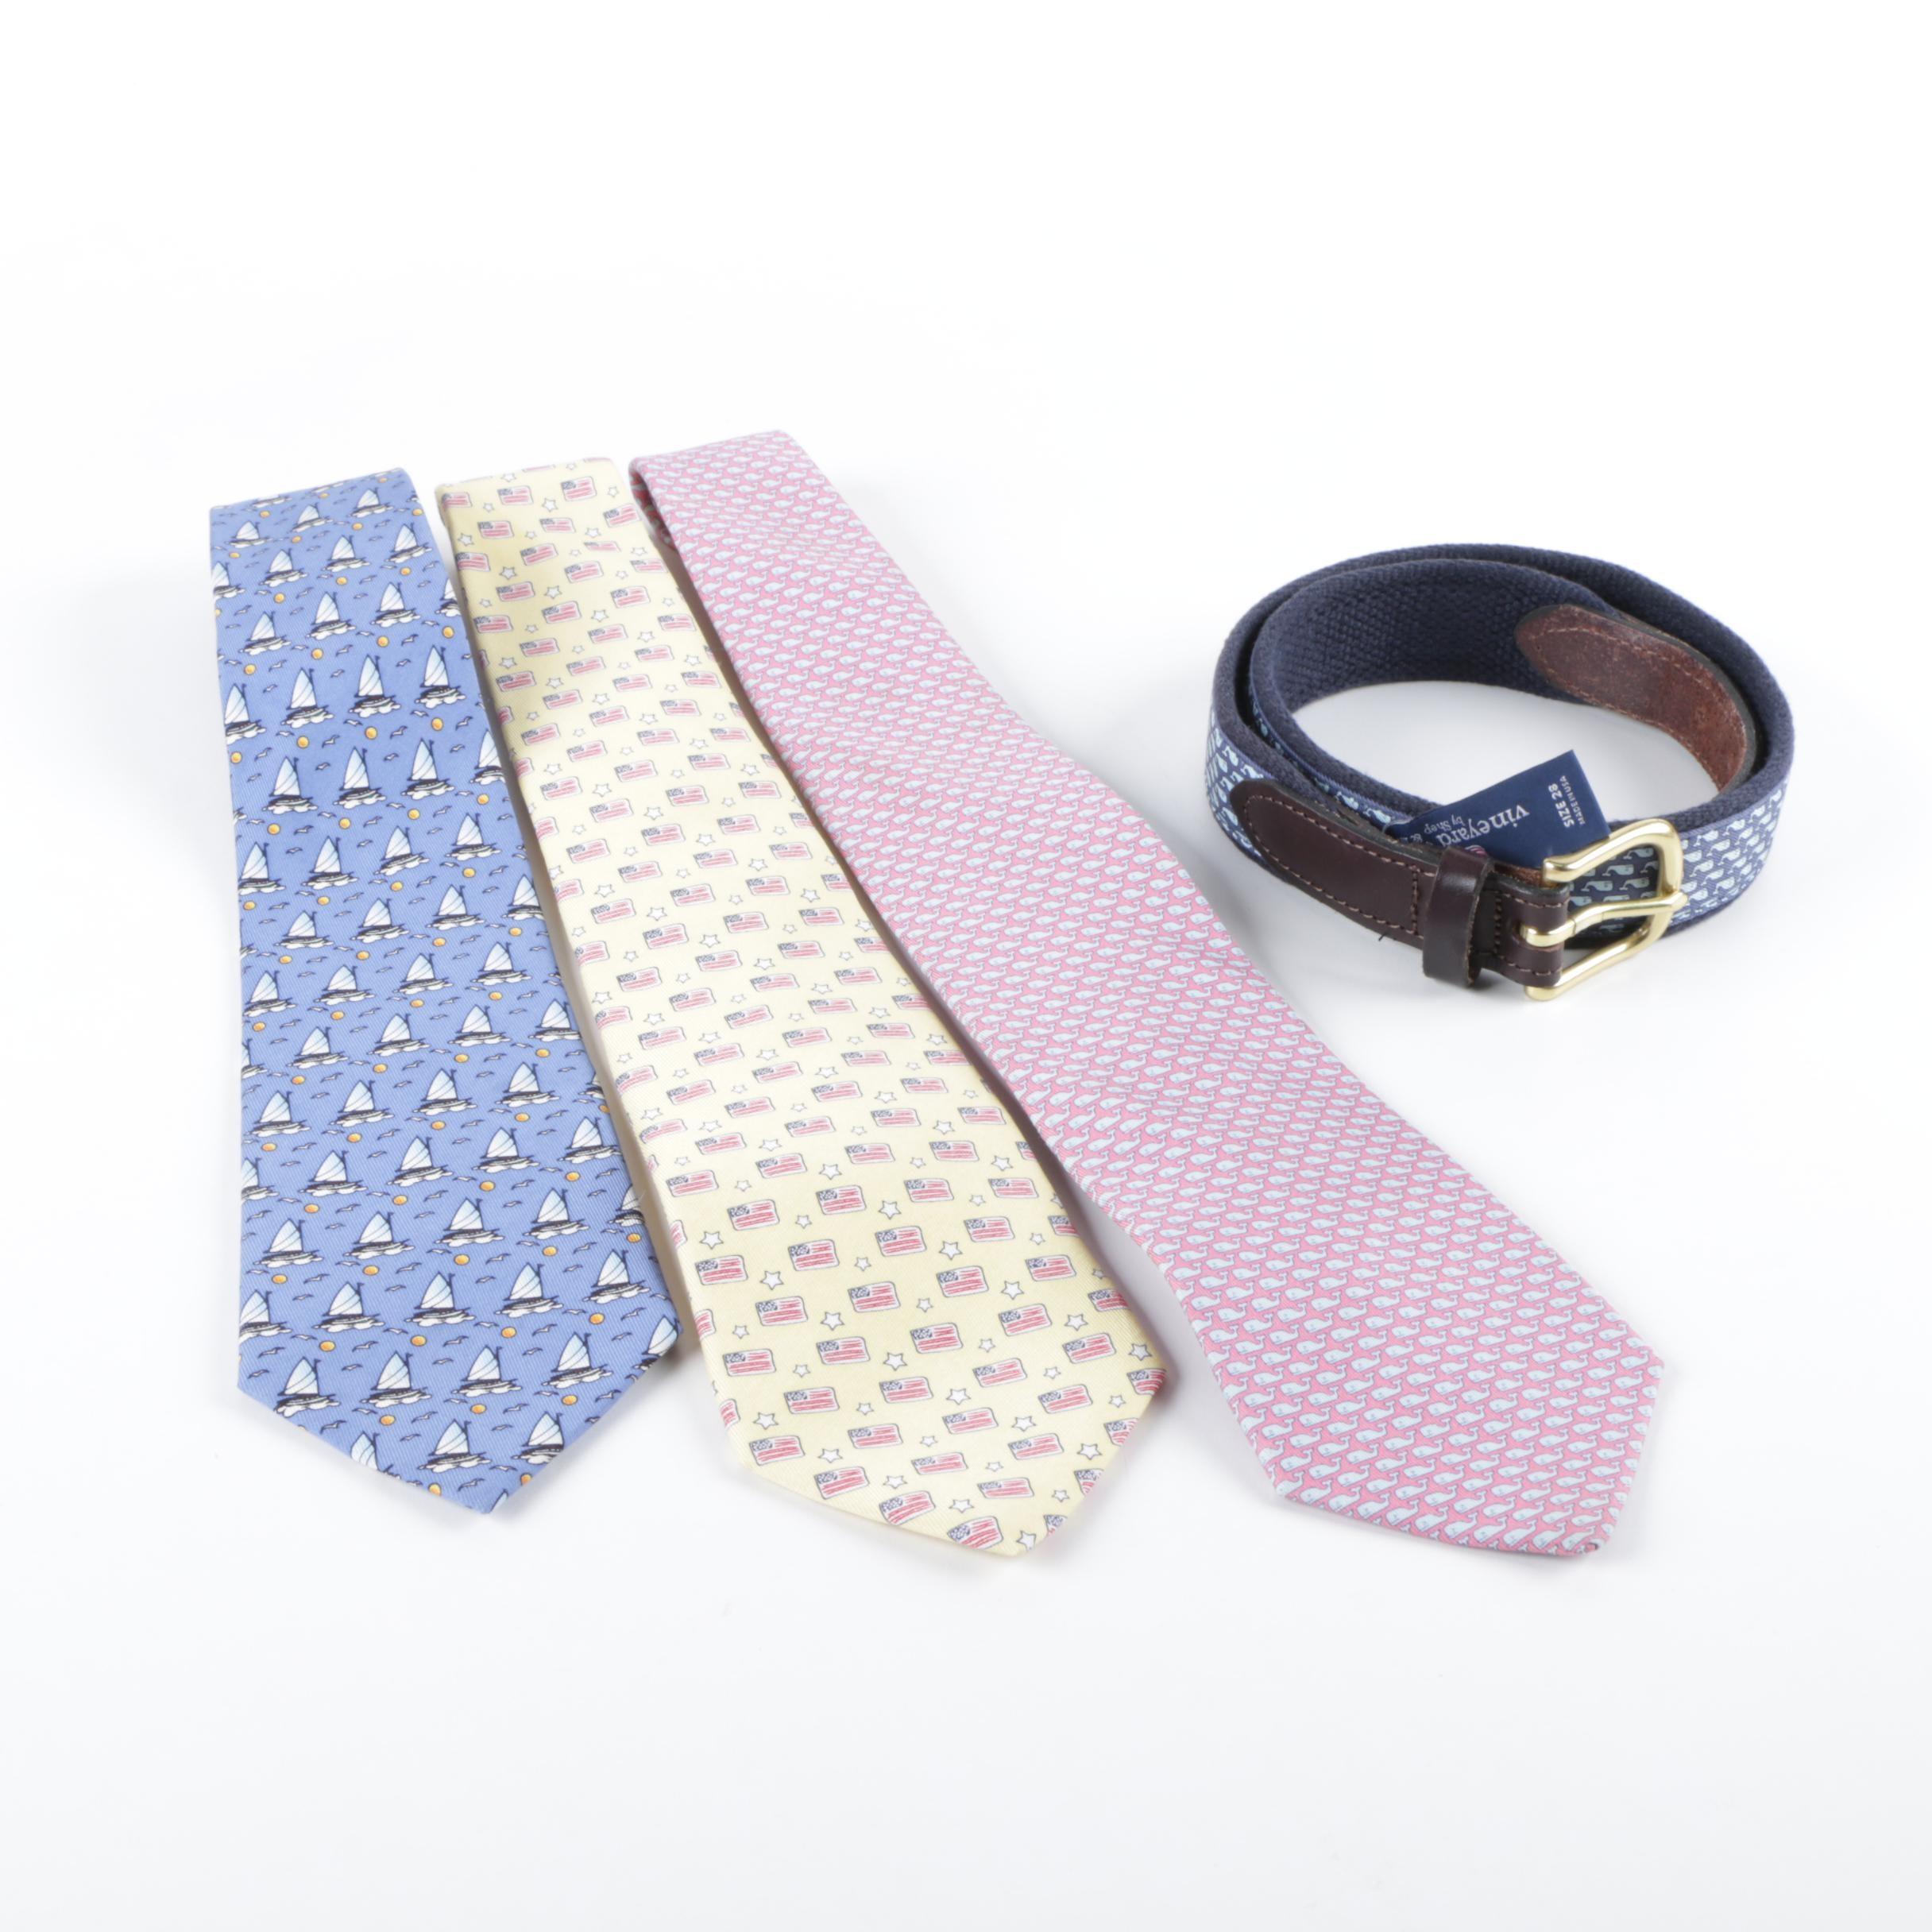 Boys' Vineyard Vines Silk Neckties and Belt